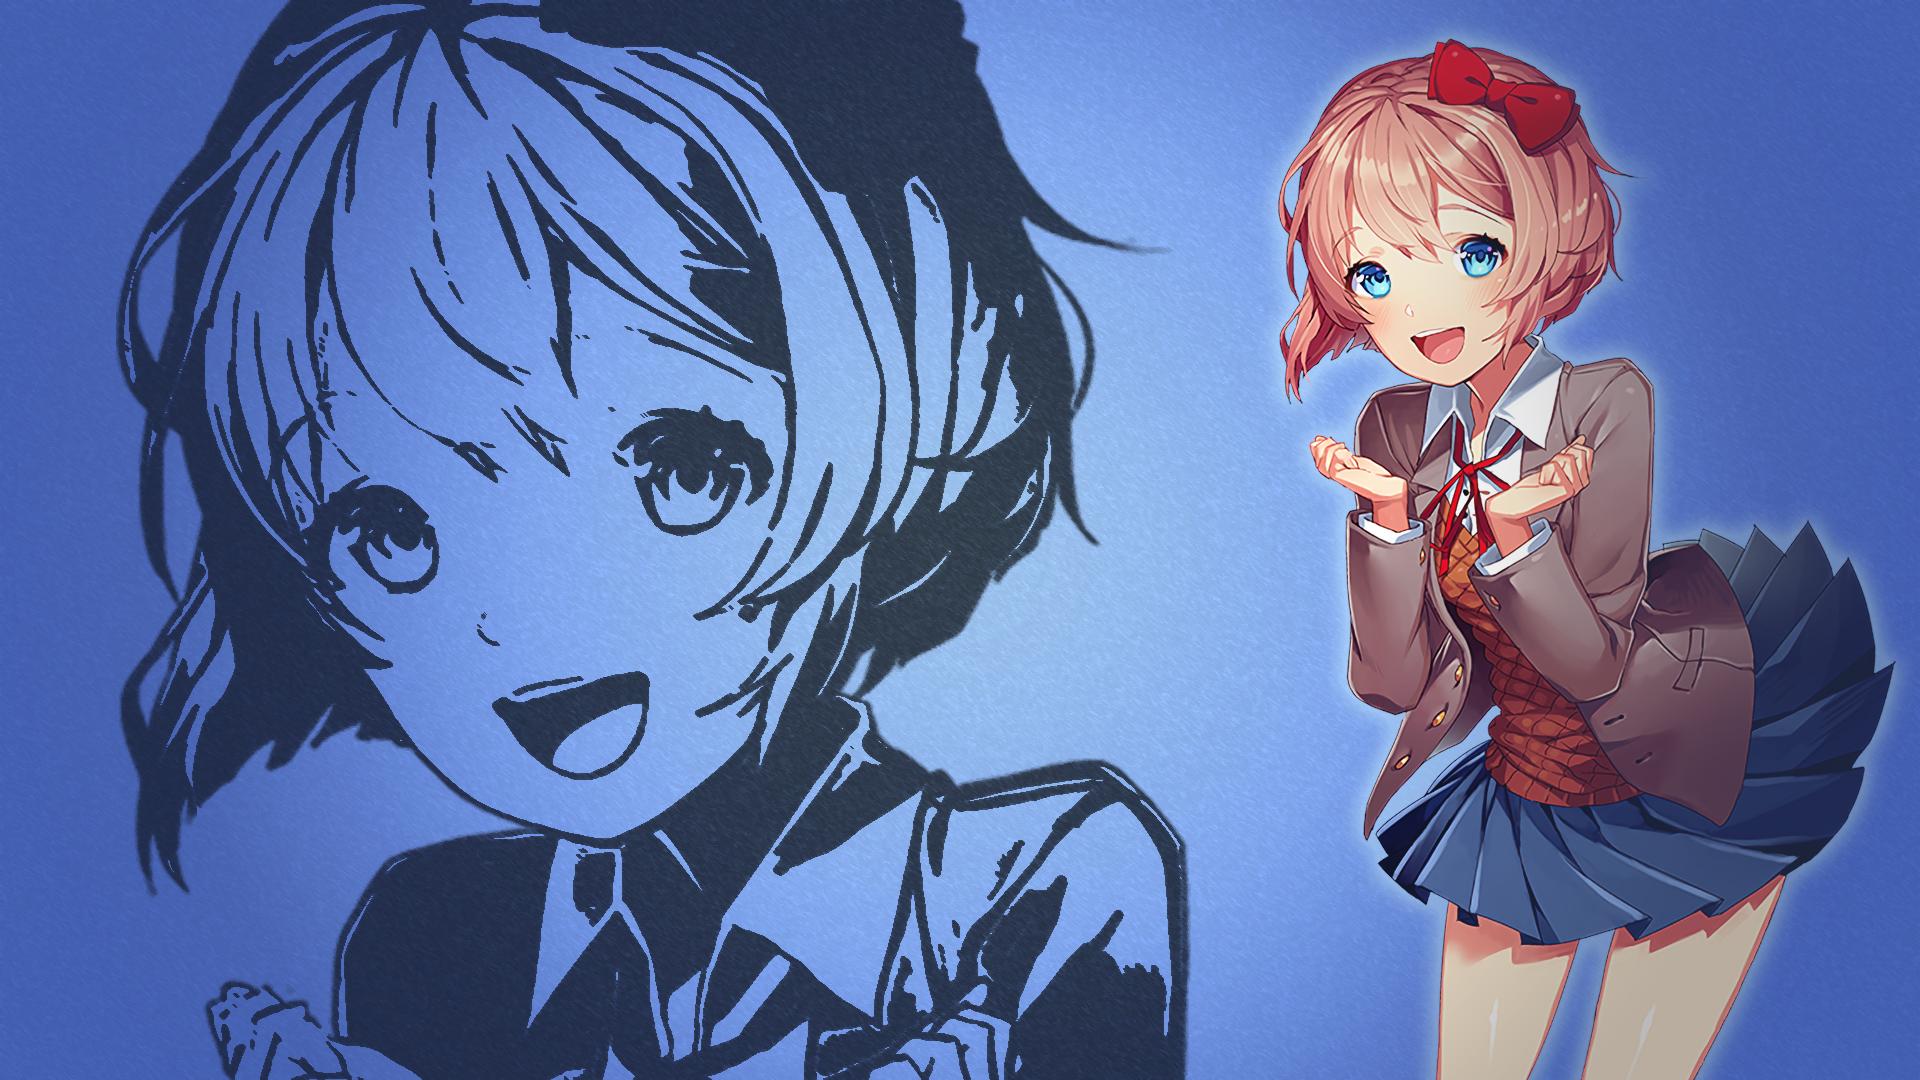 91 Doki Doki Literature Club Hd Wallpapers Background Images